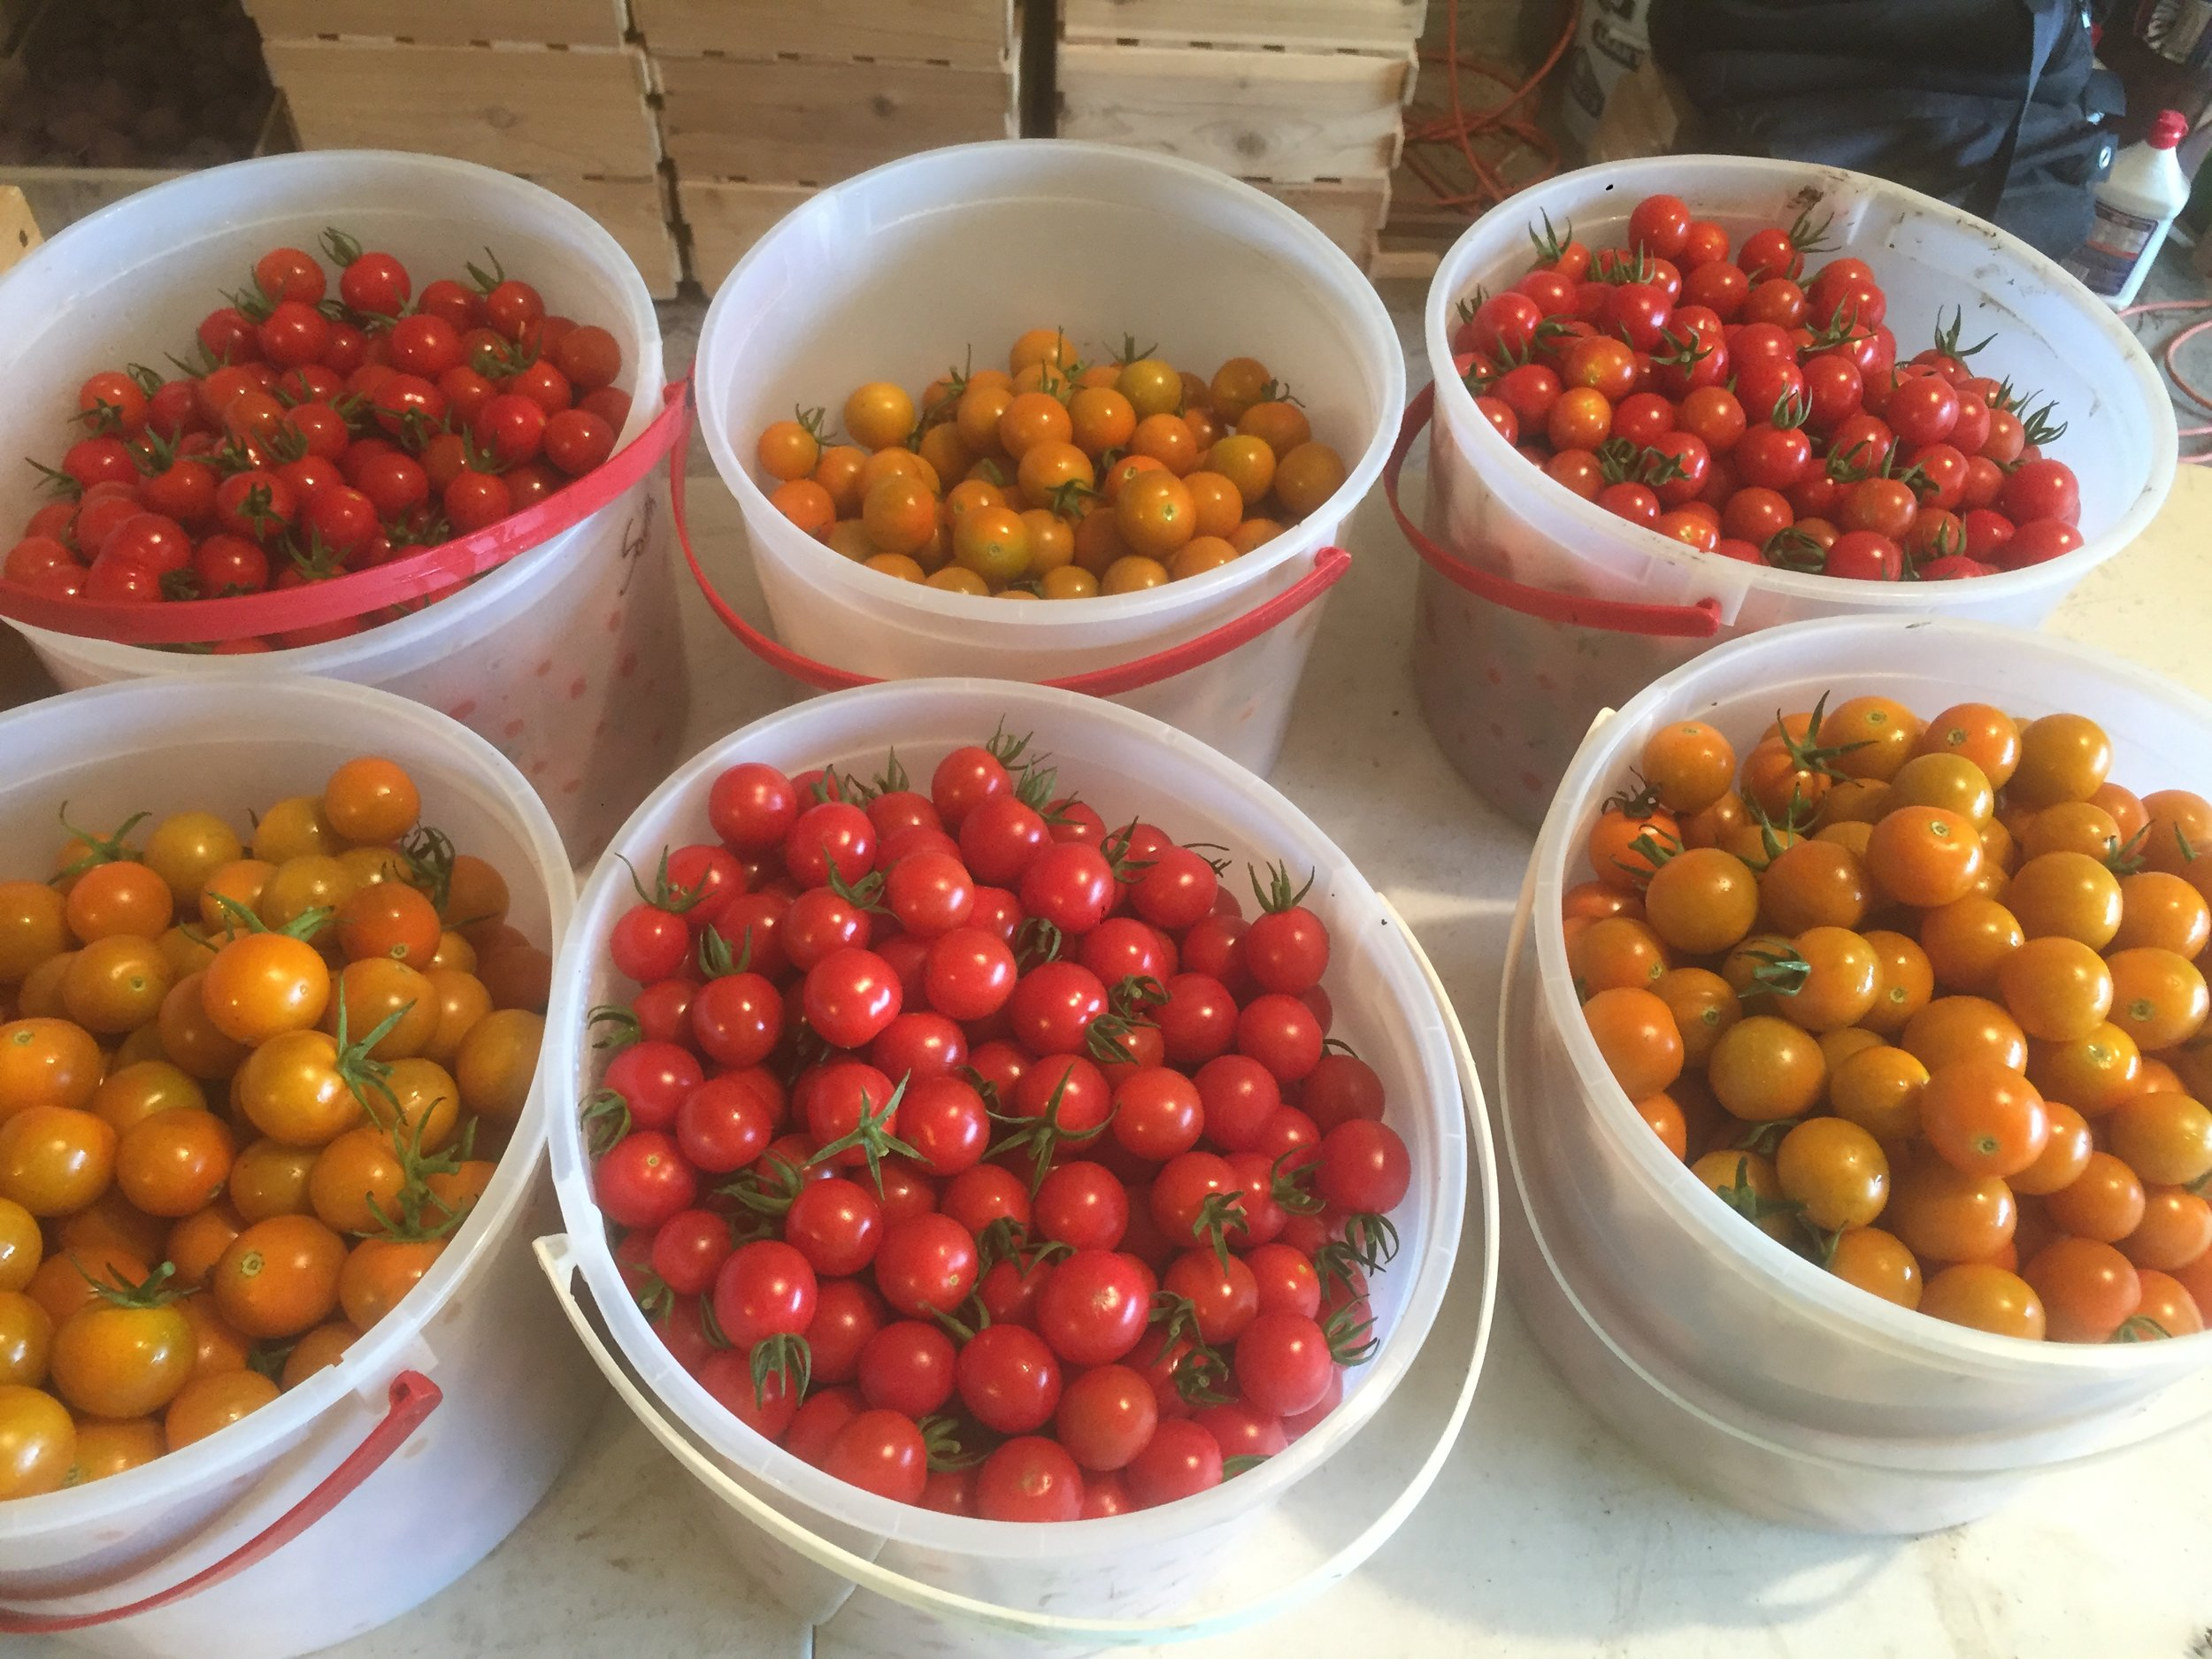 At peak season I would pick around 60lbs of cherry tomatoes a week.